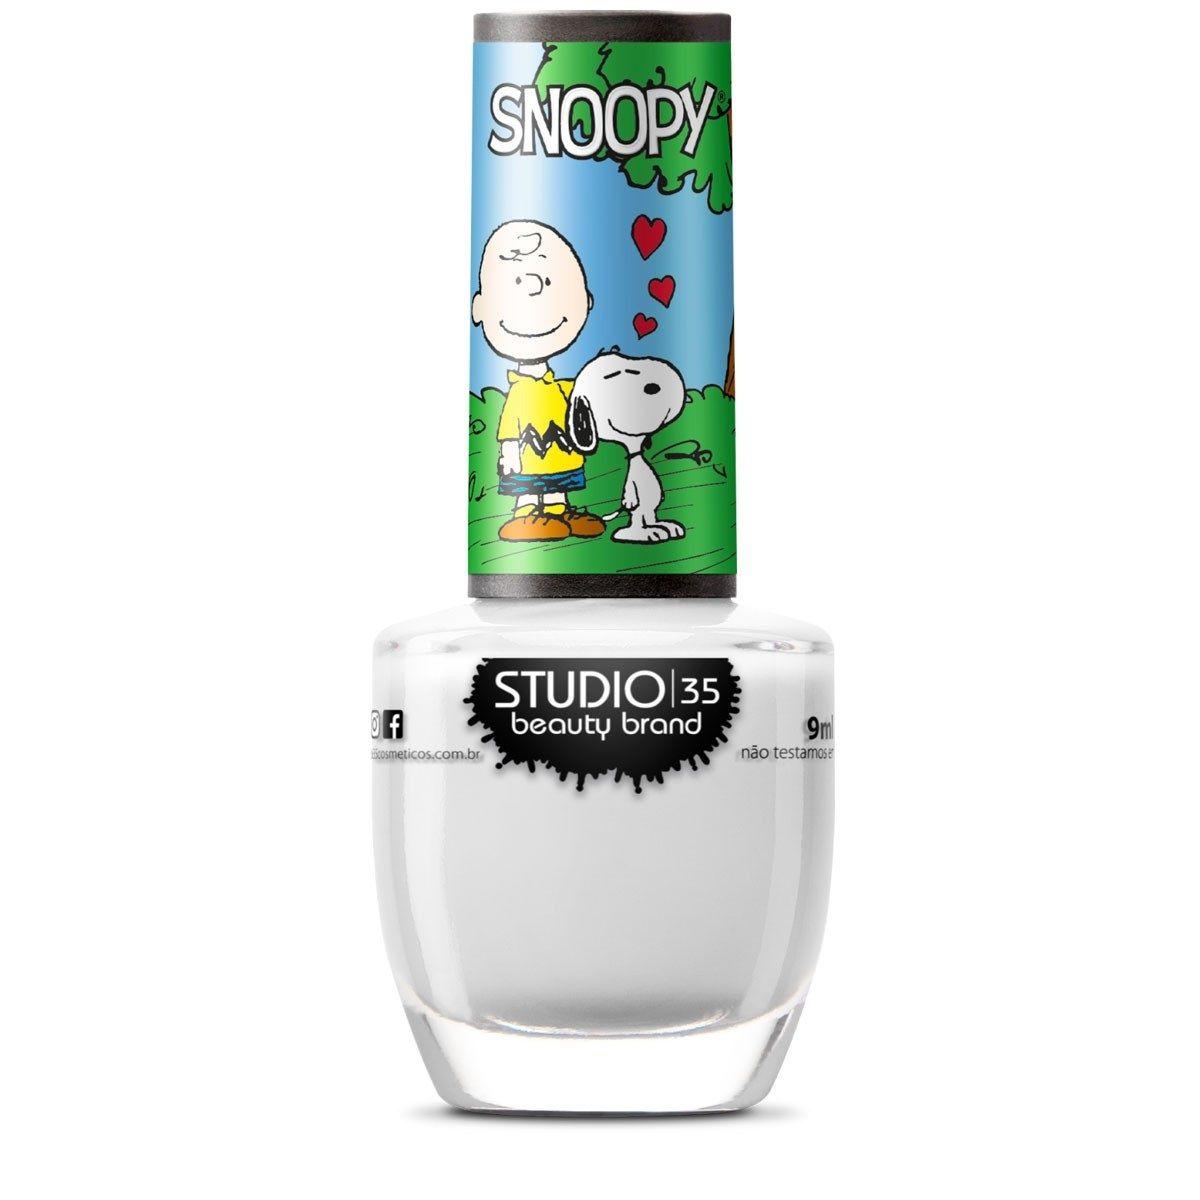 Esmalte Coleção Snoopy Cor #amocharliebrown -  9ml-Studio 35